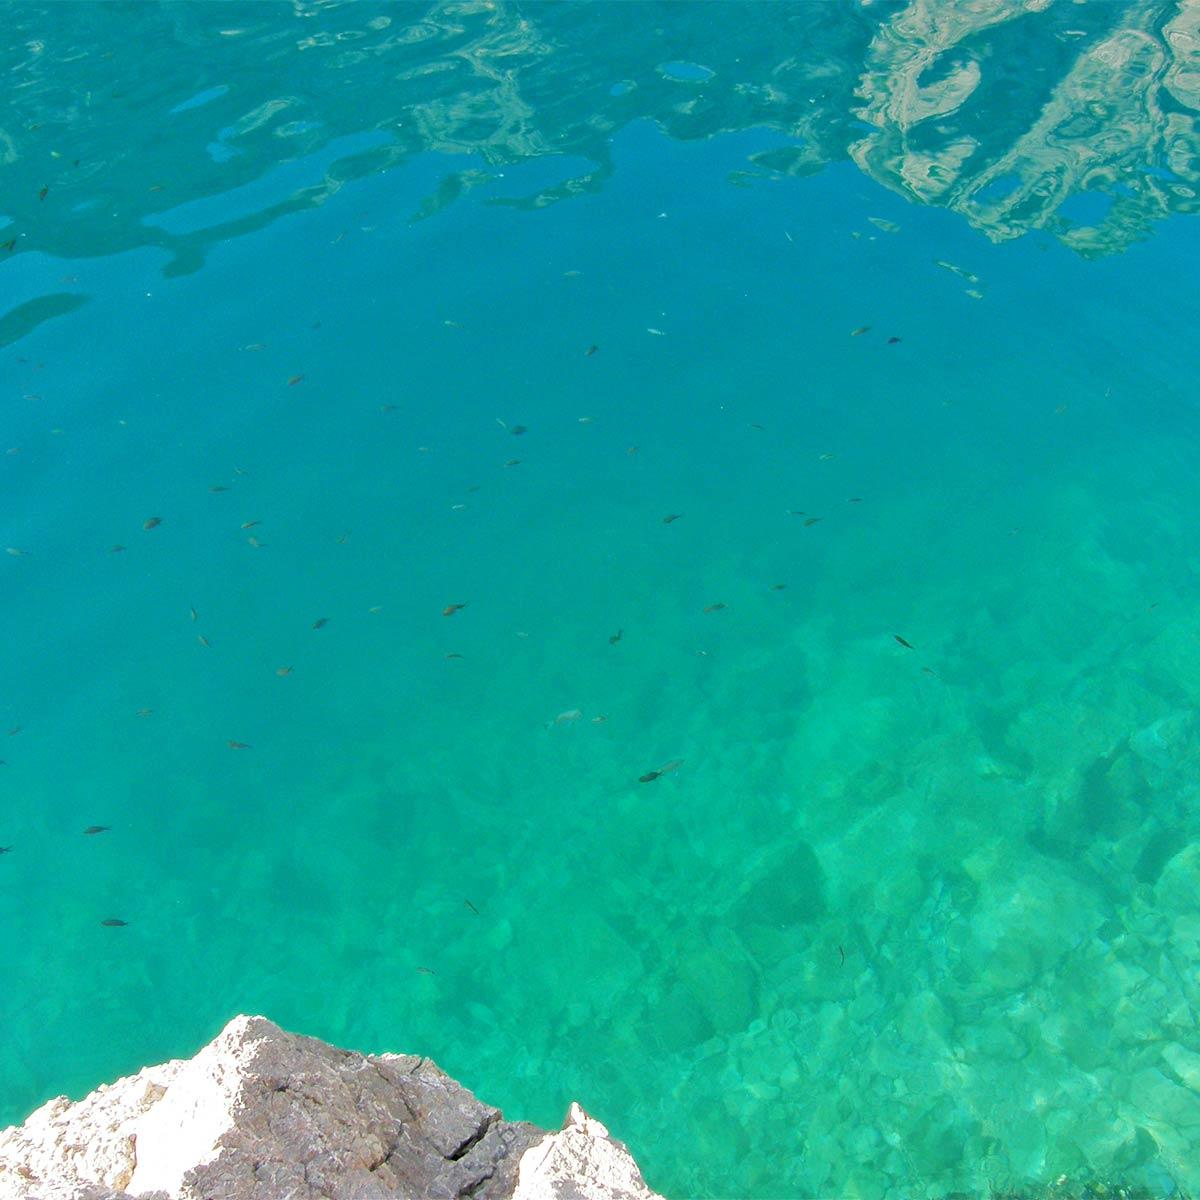 roadtrip-croatia-mer-eaux-turquoise-yoniquenews